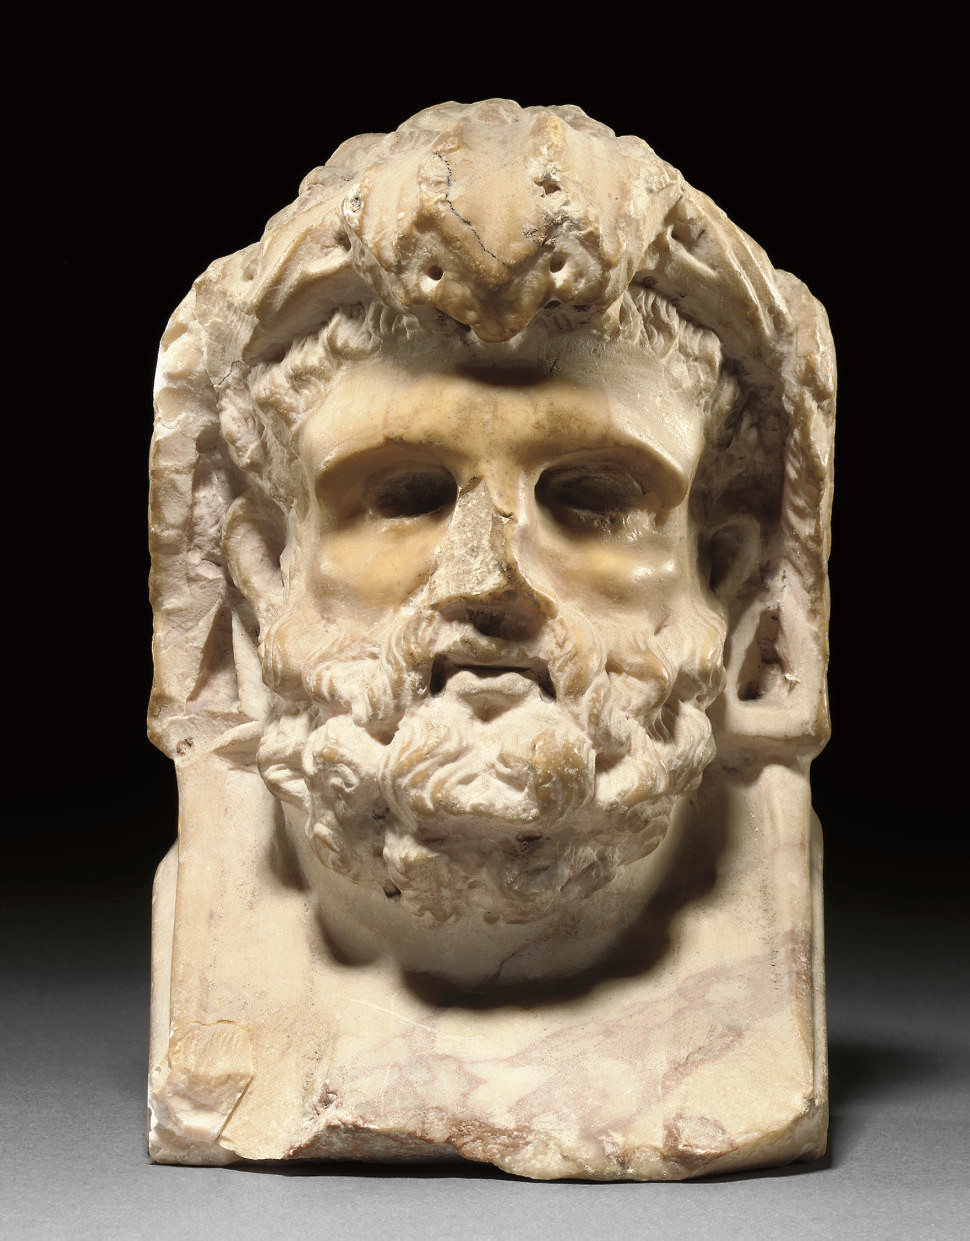 A ROMAN VEINED MARBLE HERM HEA